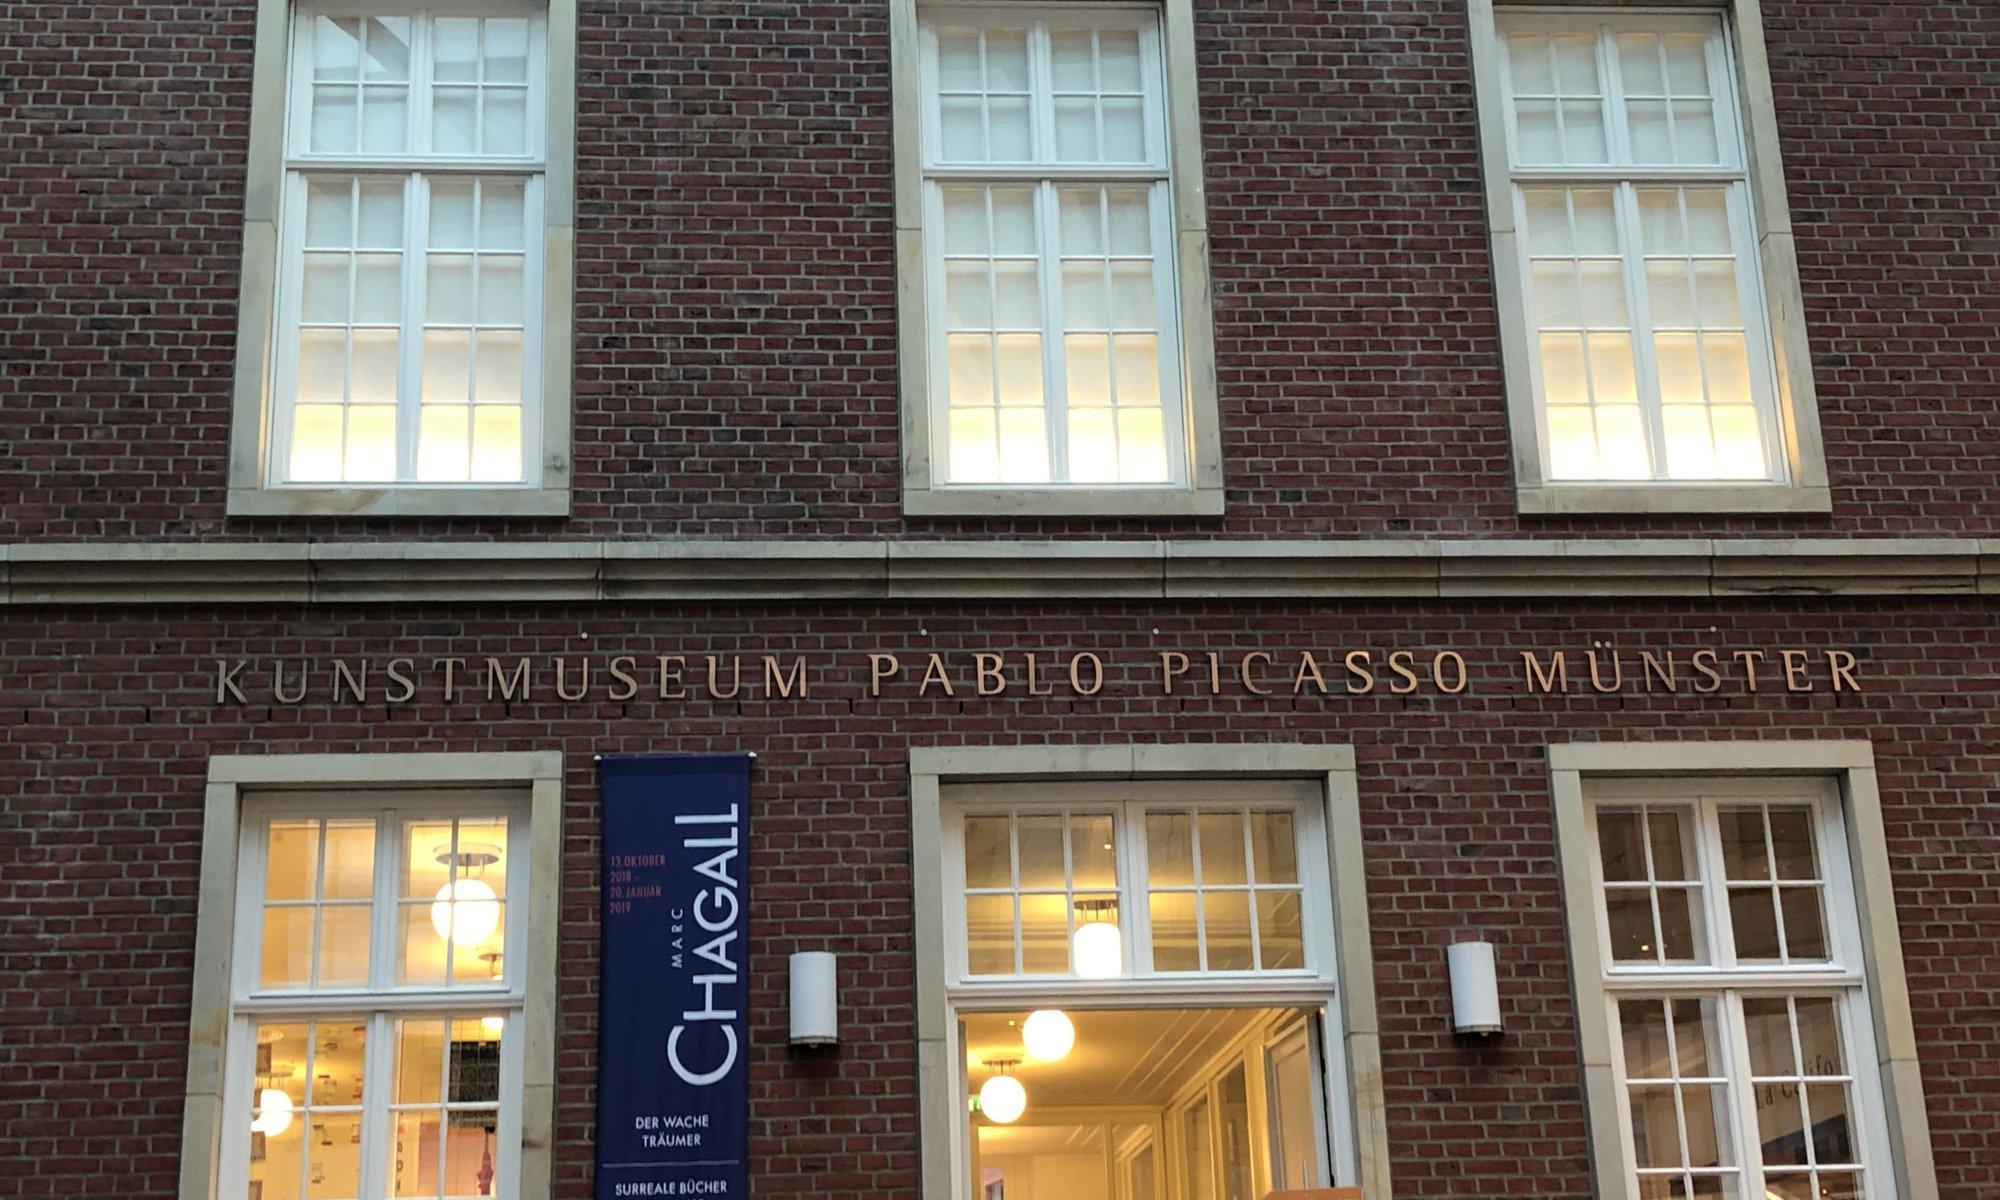 Kunstmuseum Pablo Picasso, Münster in Westfalen